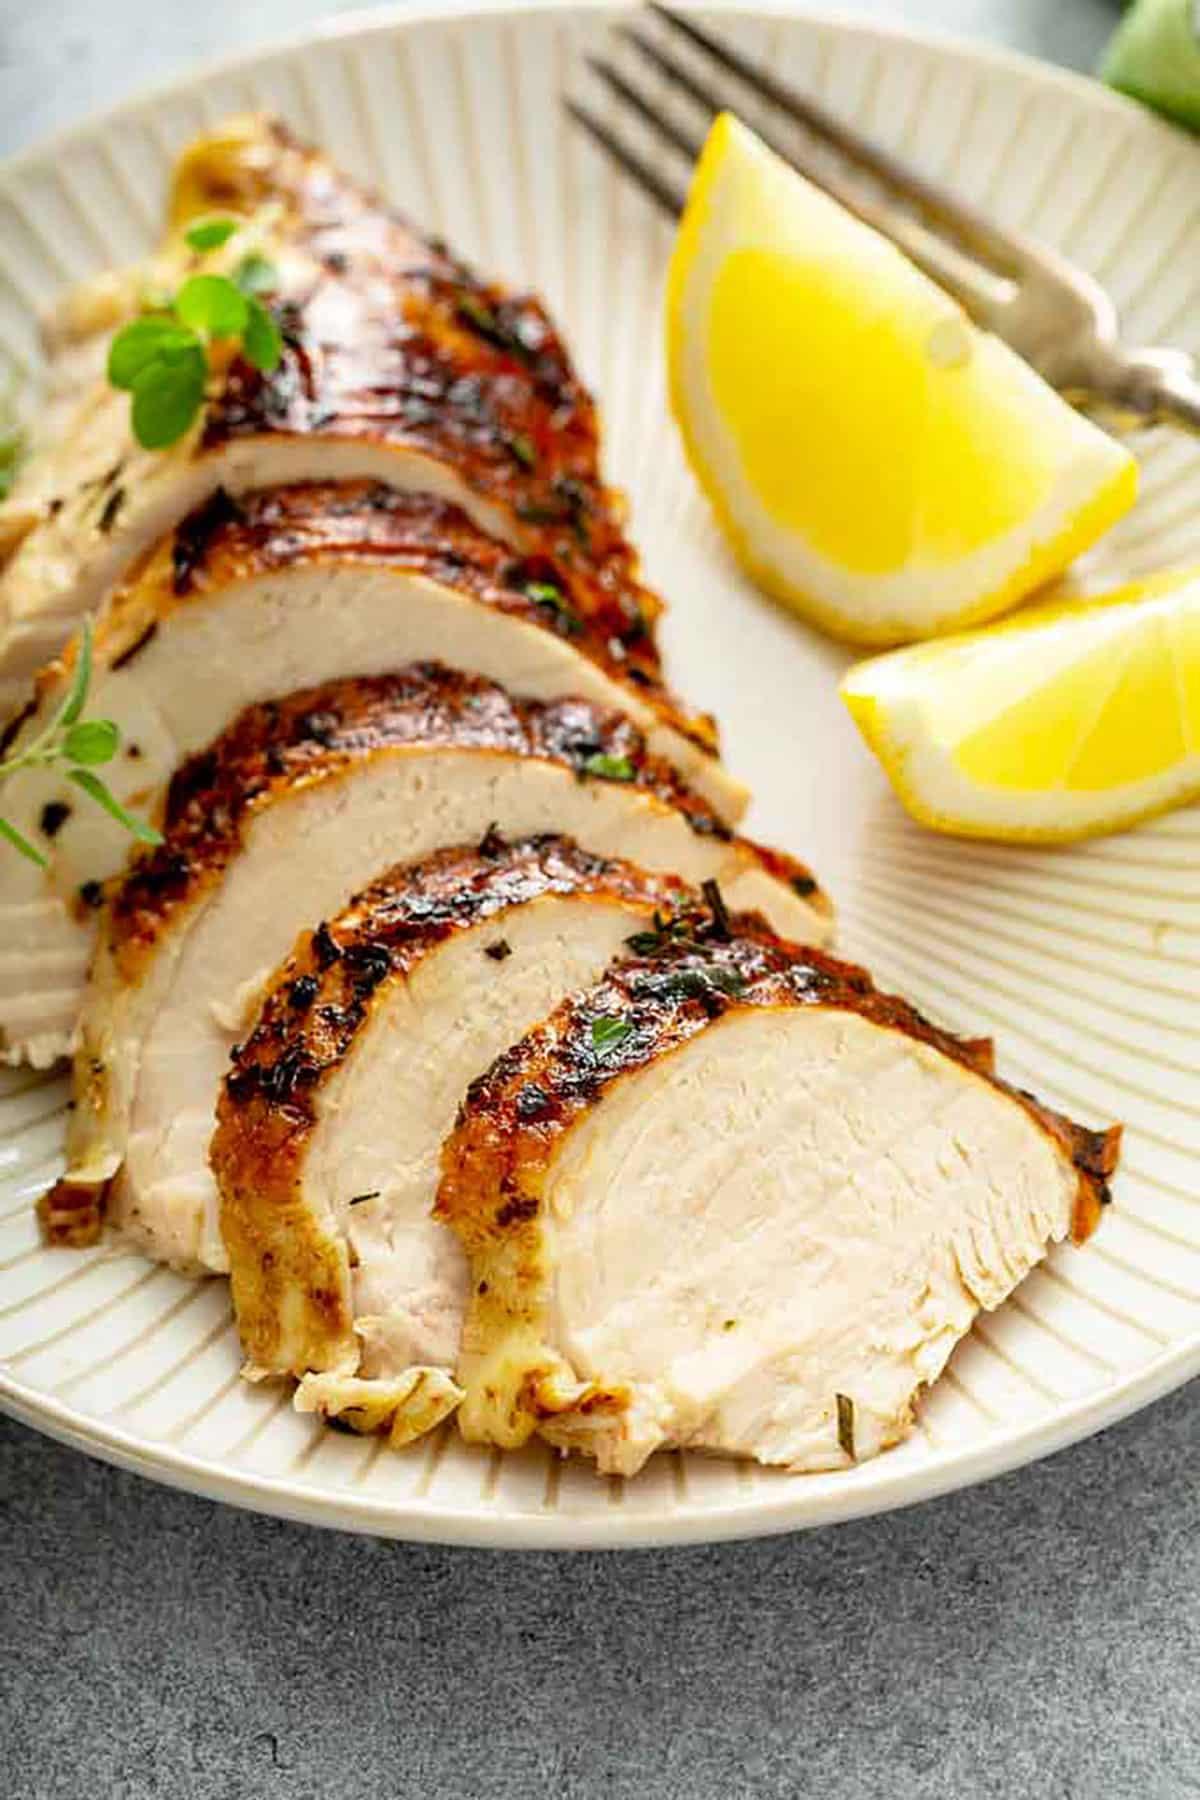 Sliced roast chicken on a plate